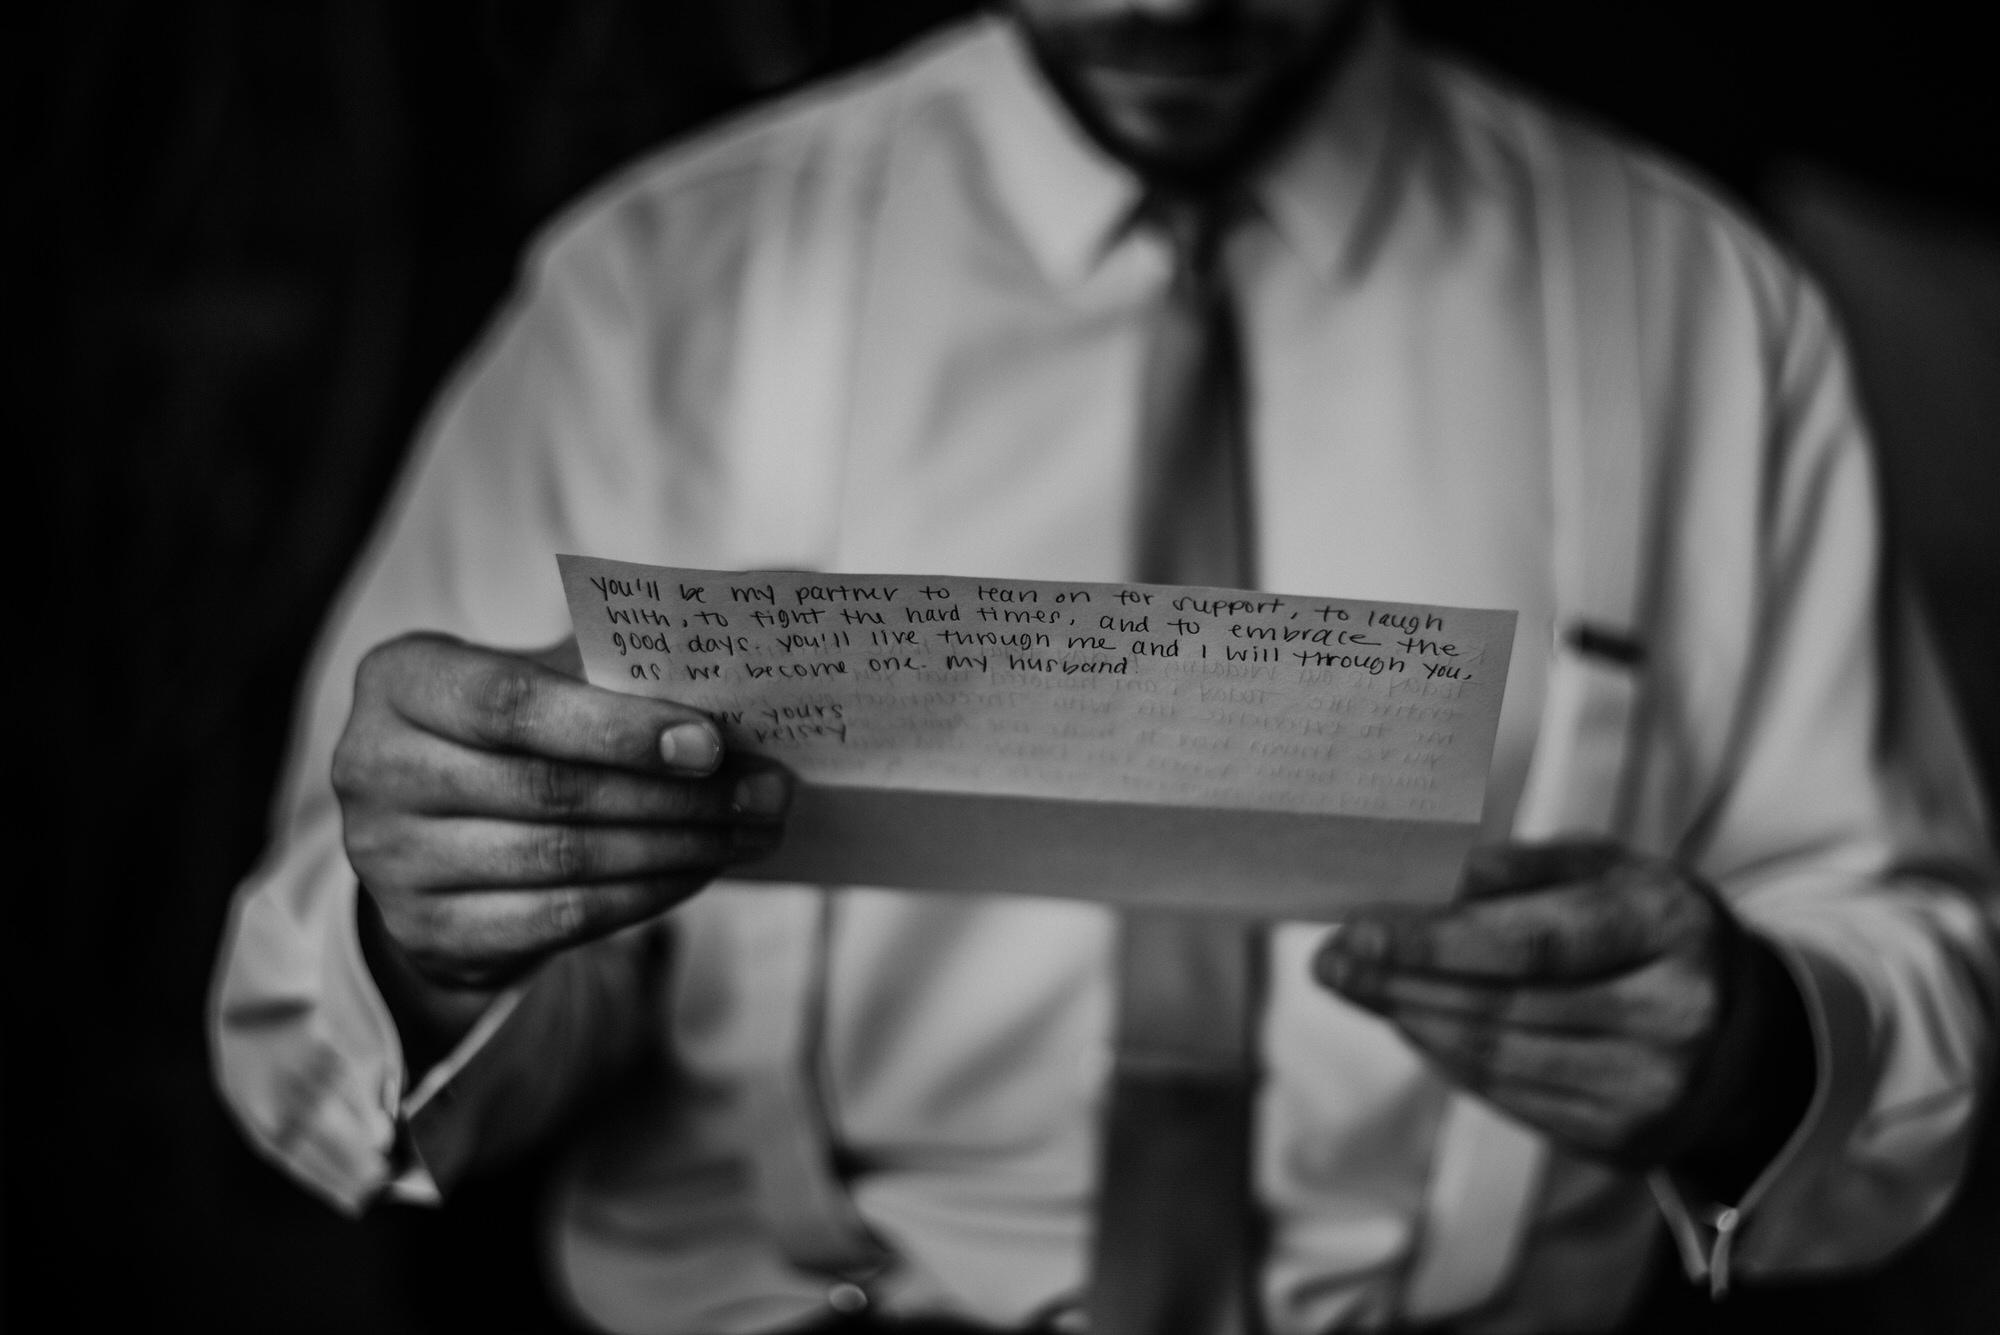 Kaylie_Sirek_Photography_Grand_Island_Kearney_Hastings_Lincoln_Nebraska_Wedding_Engagement_Grandma_Grandparent_Delray_Downtown_DowntownLincoln_LNK_Emotional_Bride_Groom_Photographer_16.jpg